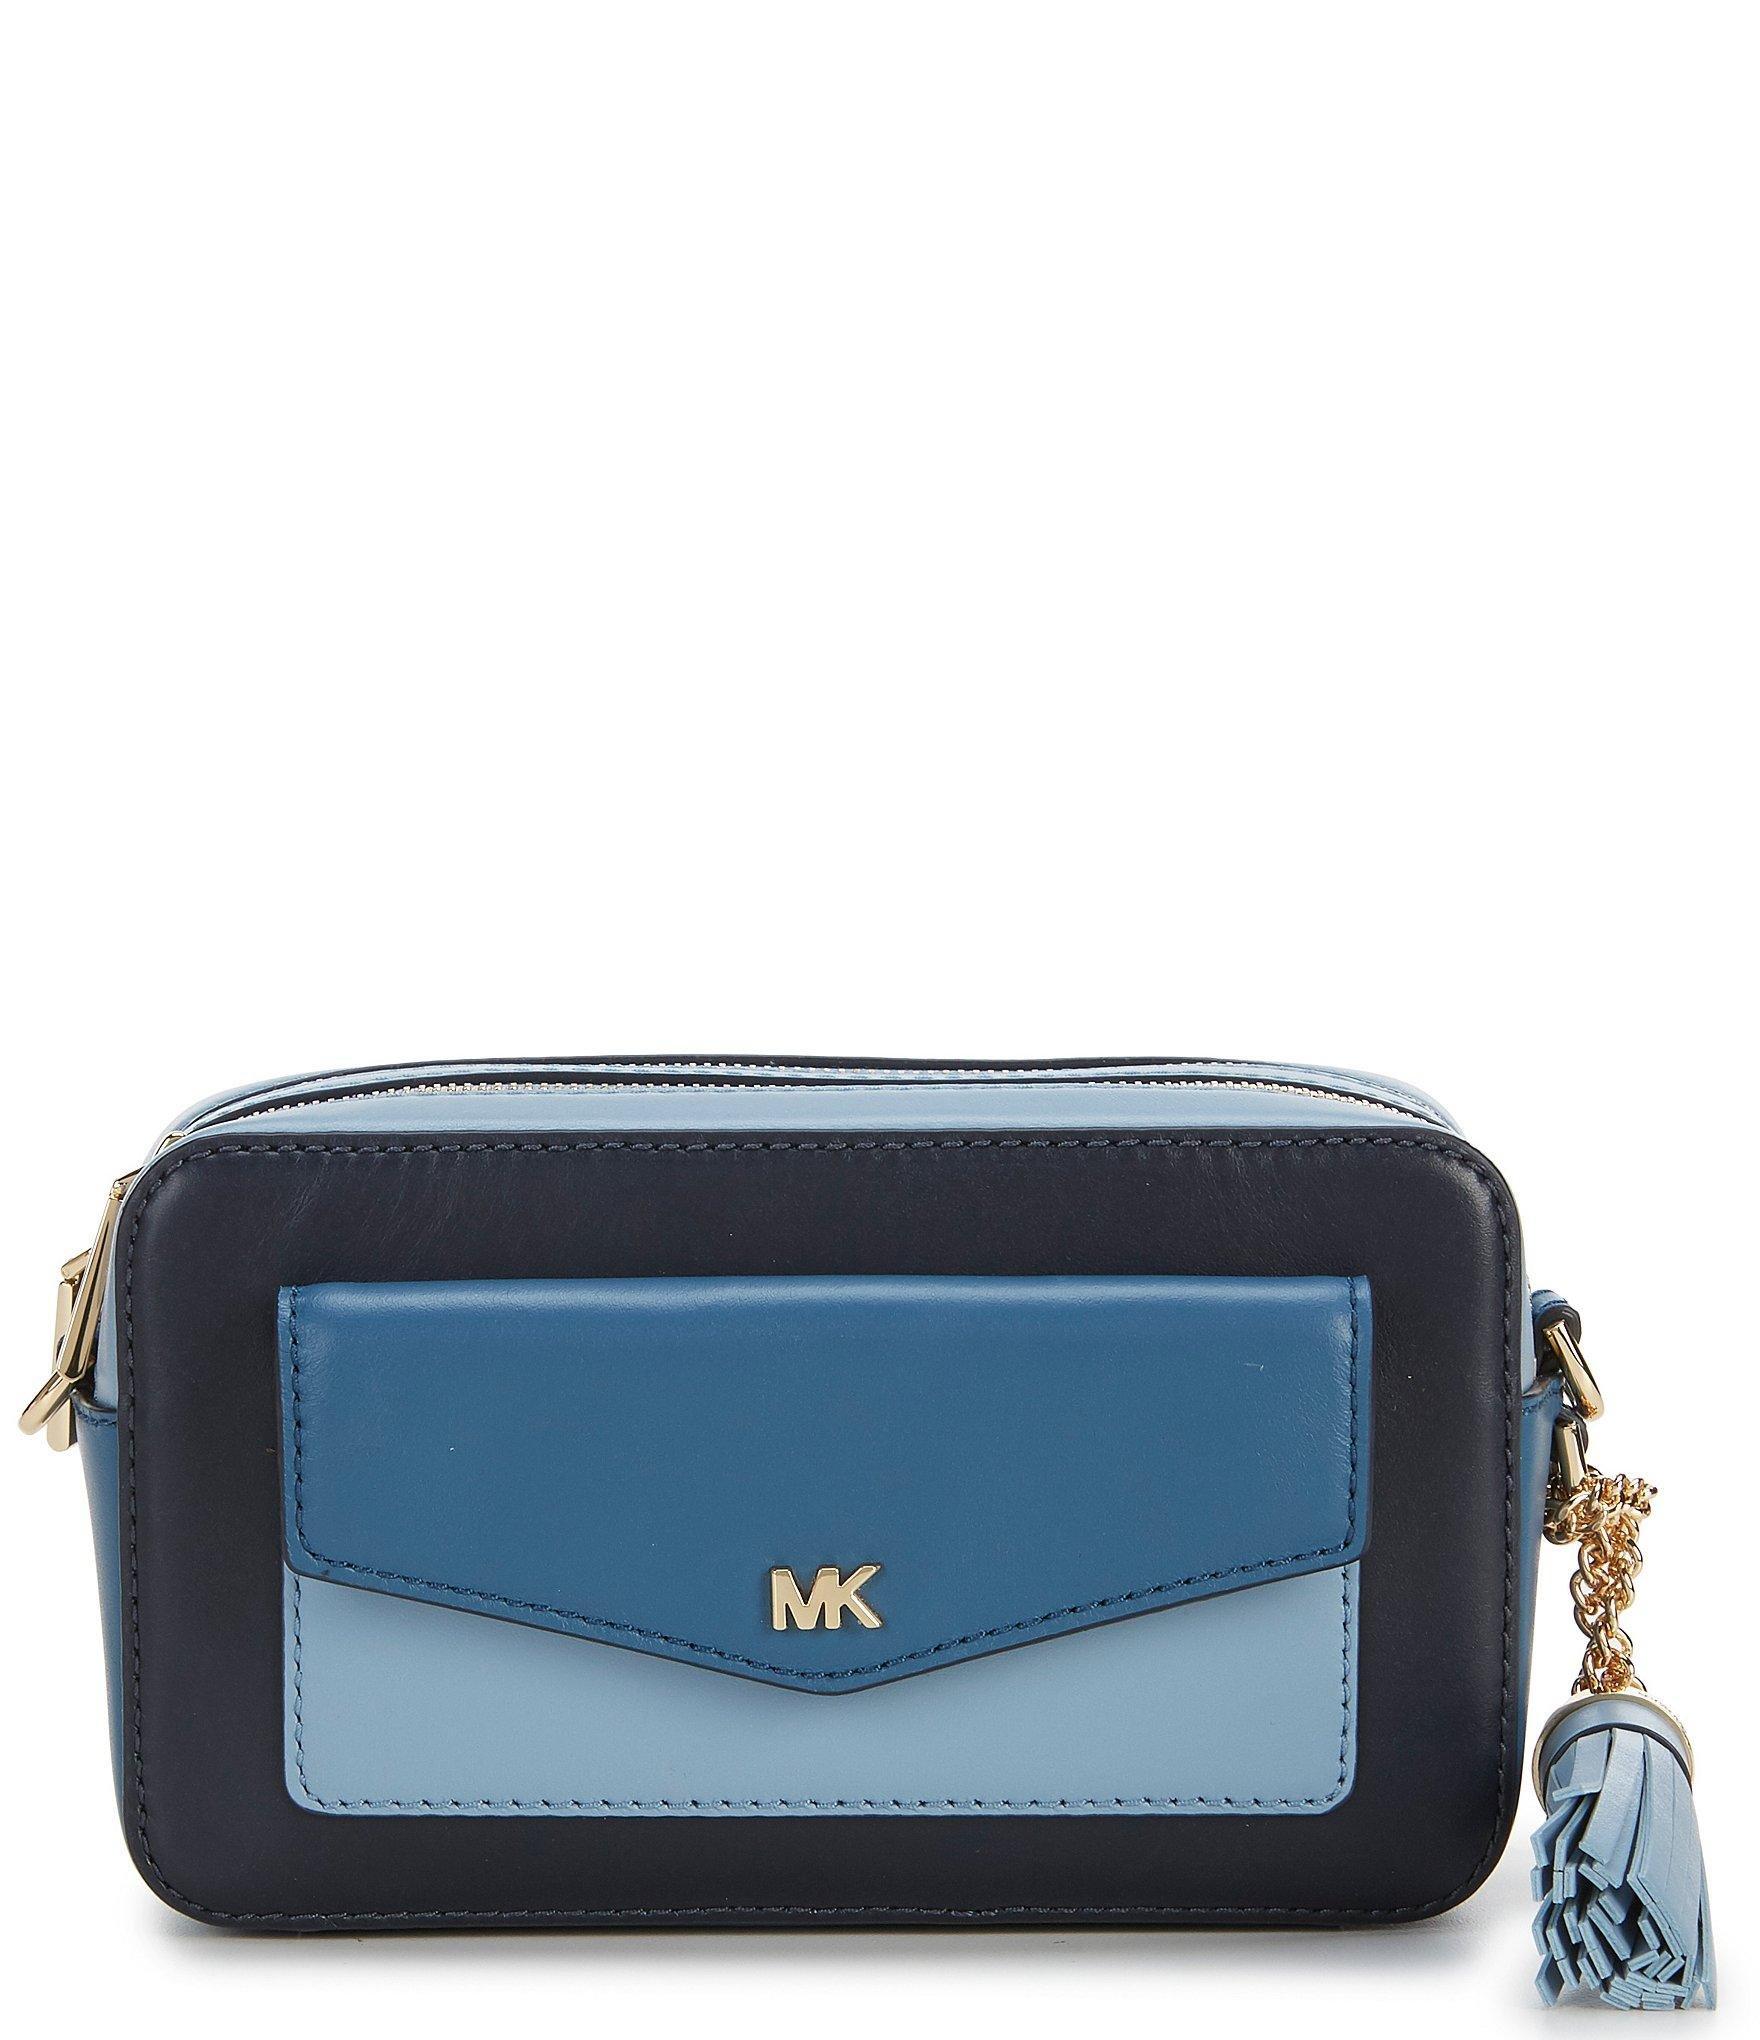 ab0aa9d169 MICHAEL Michael Kors. Women s Blue Small Tri-color Pocket Camera Cross-body  Bag